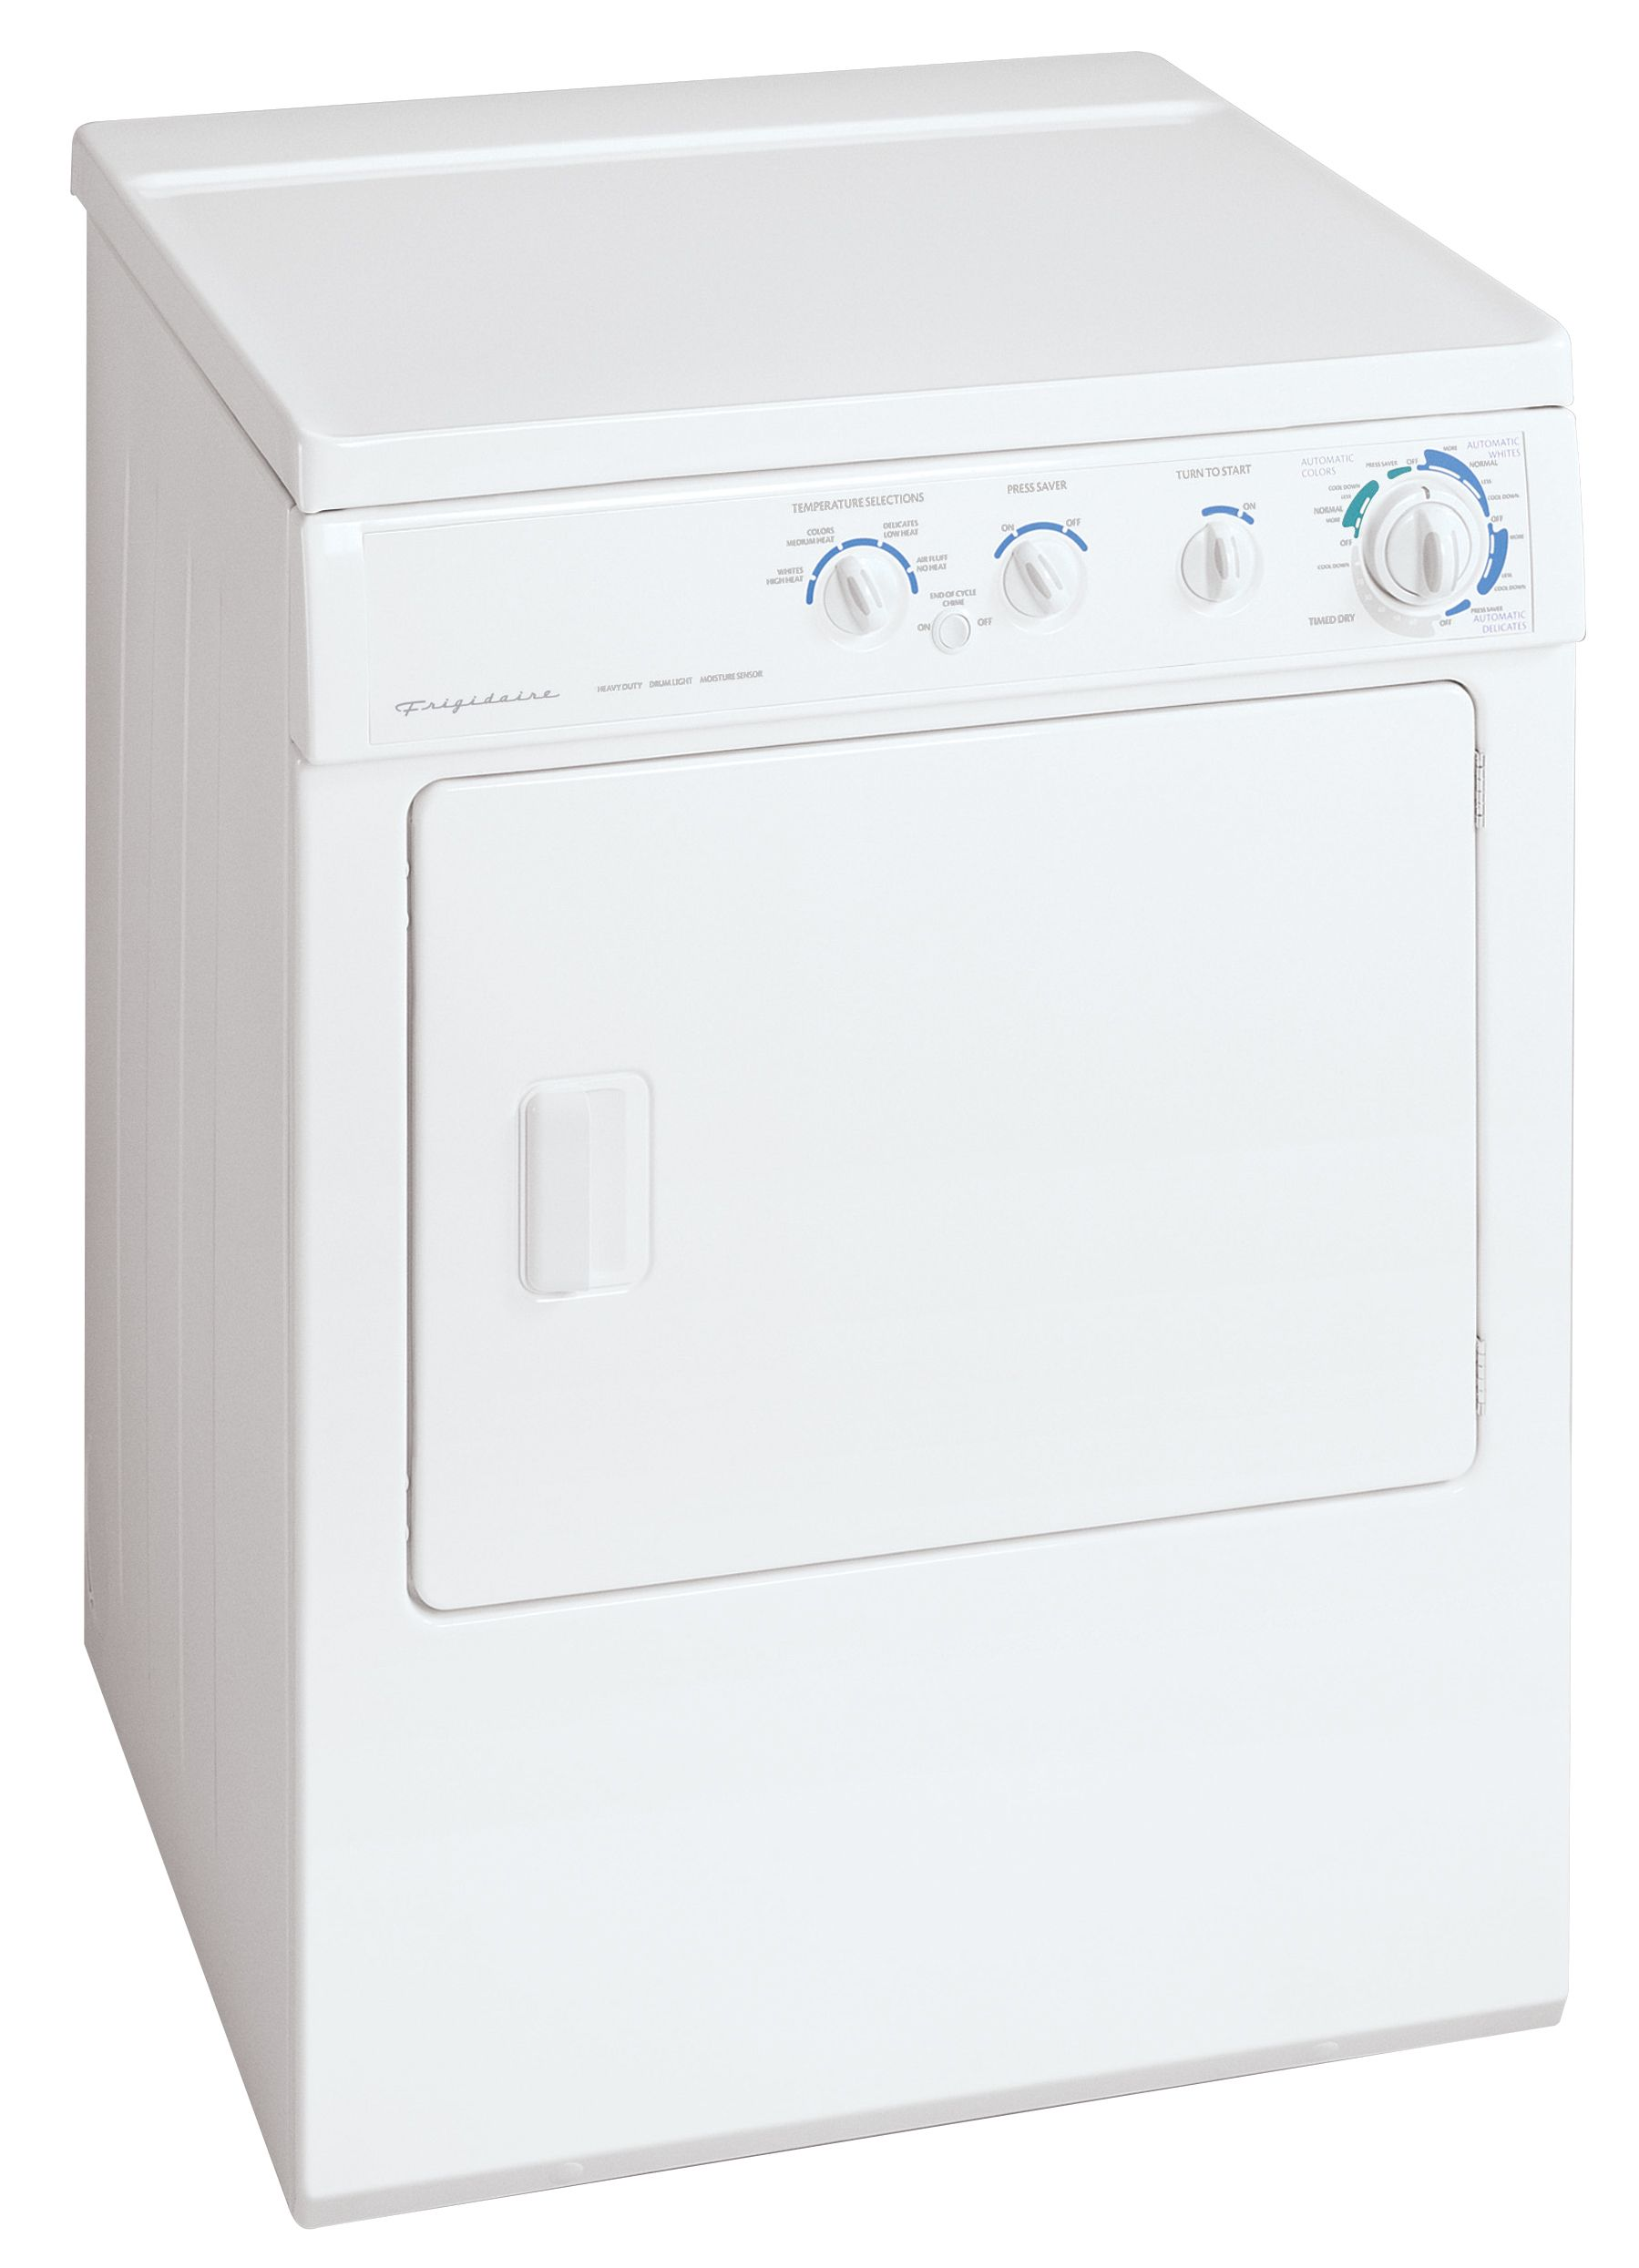 Frigidaire Electric Dryer 5.7 cu. ft. FEQ332ES - Sears